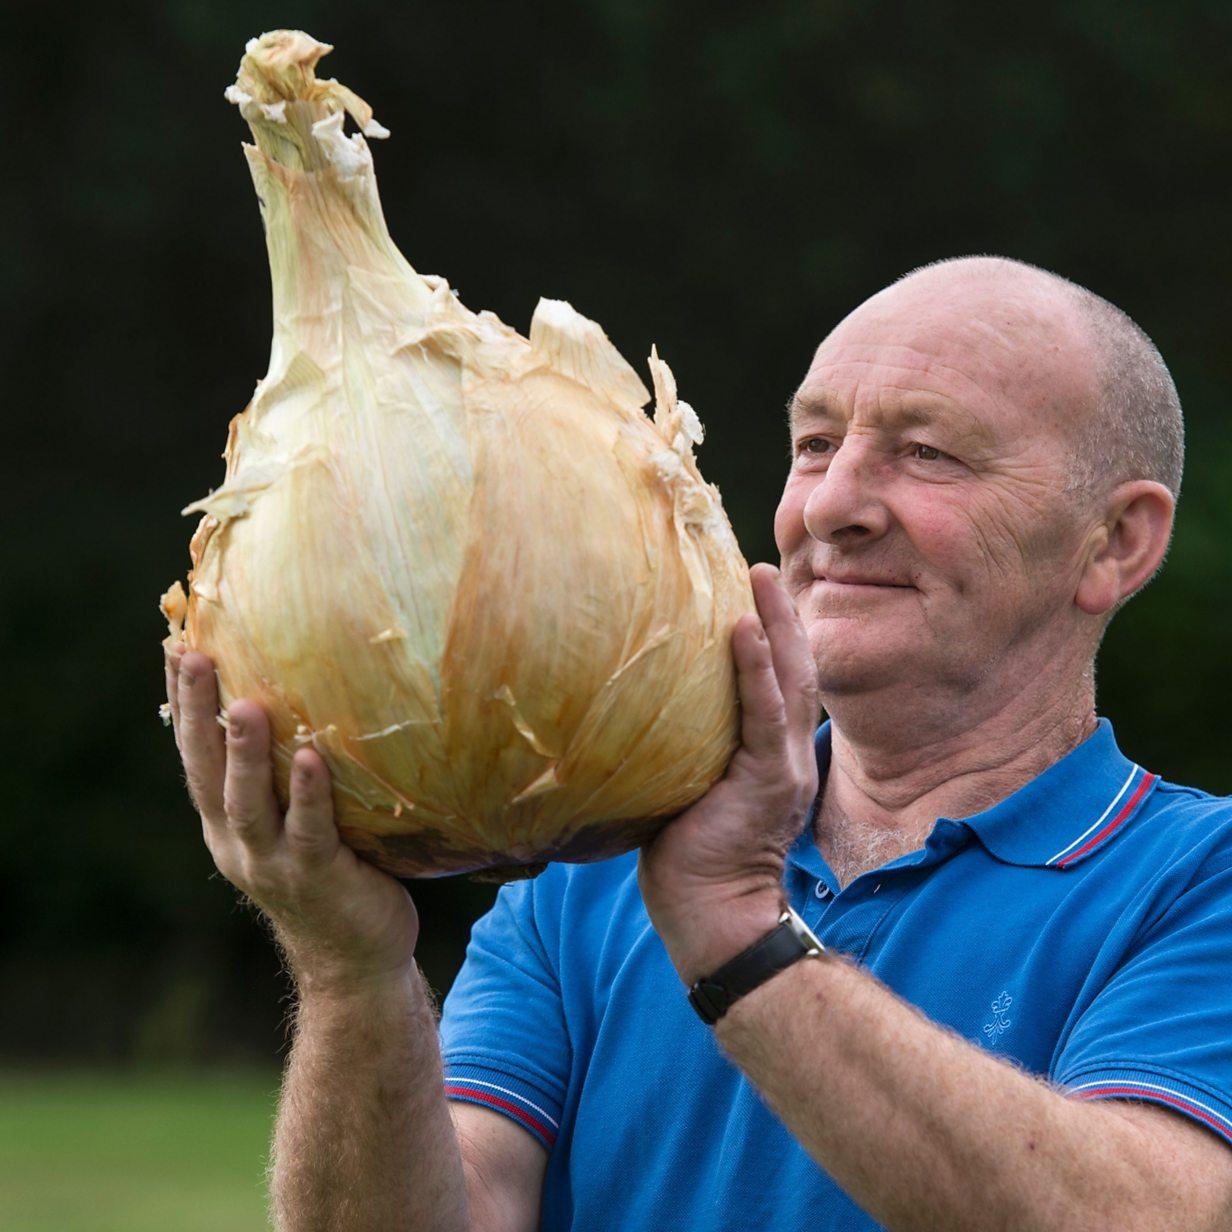 Man's giant vegetables set new world records - BBC News